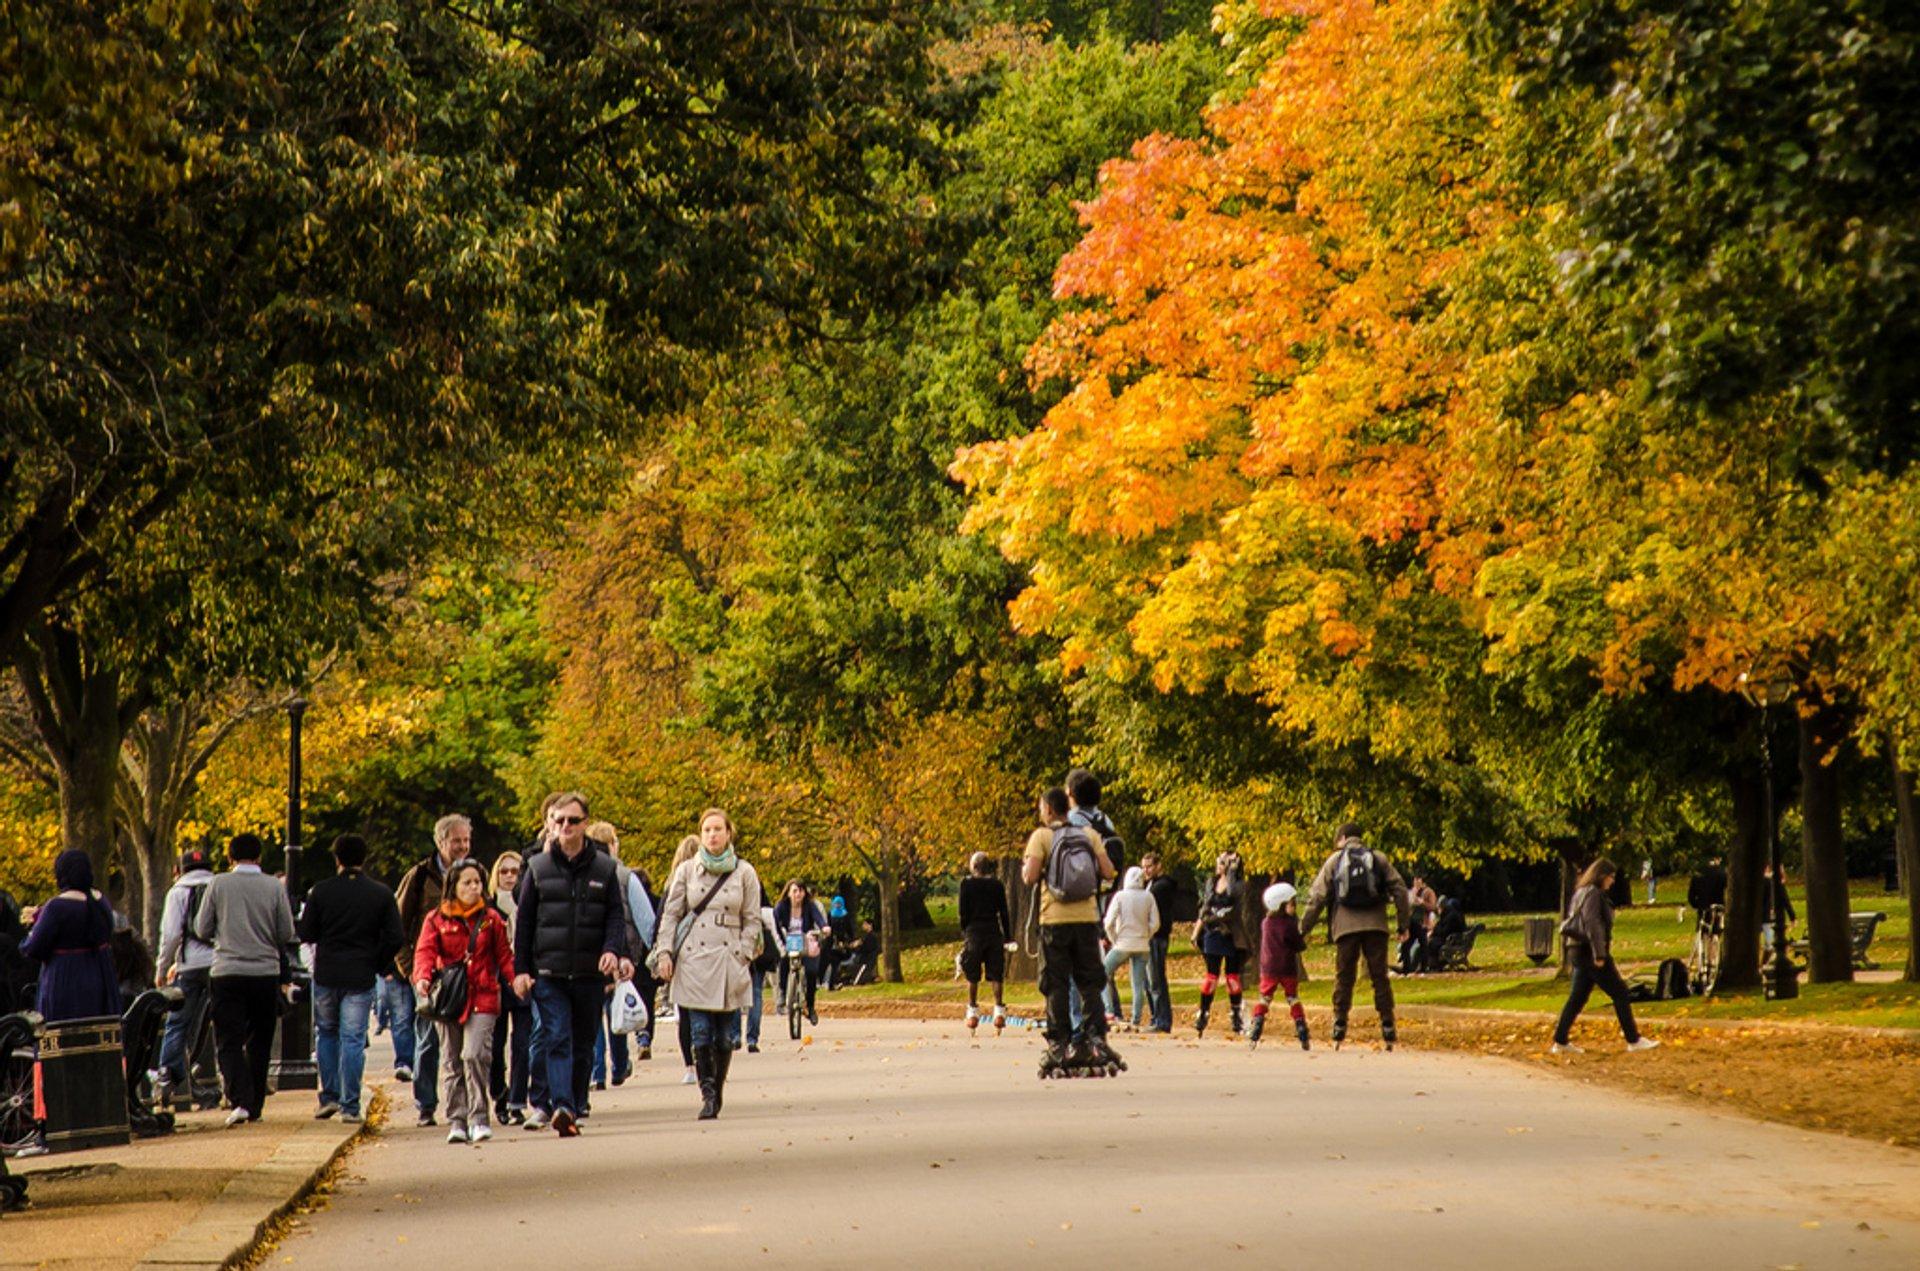 Autumn in London - Best Season 2020